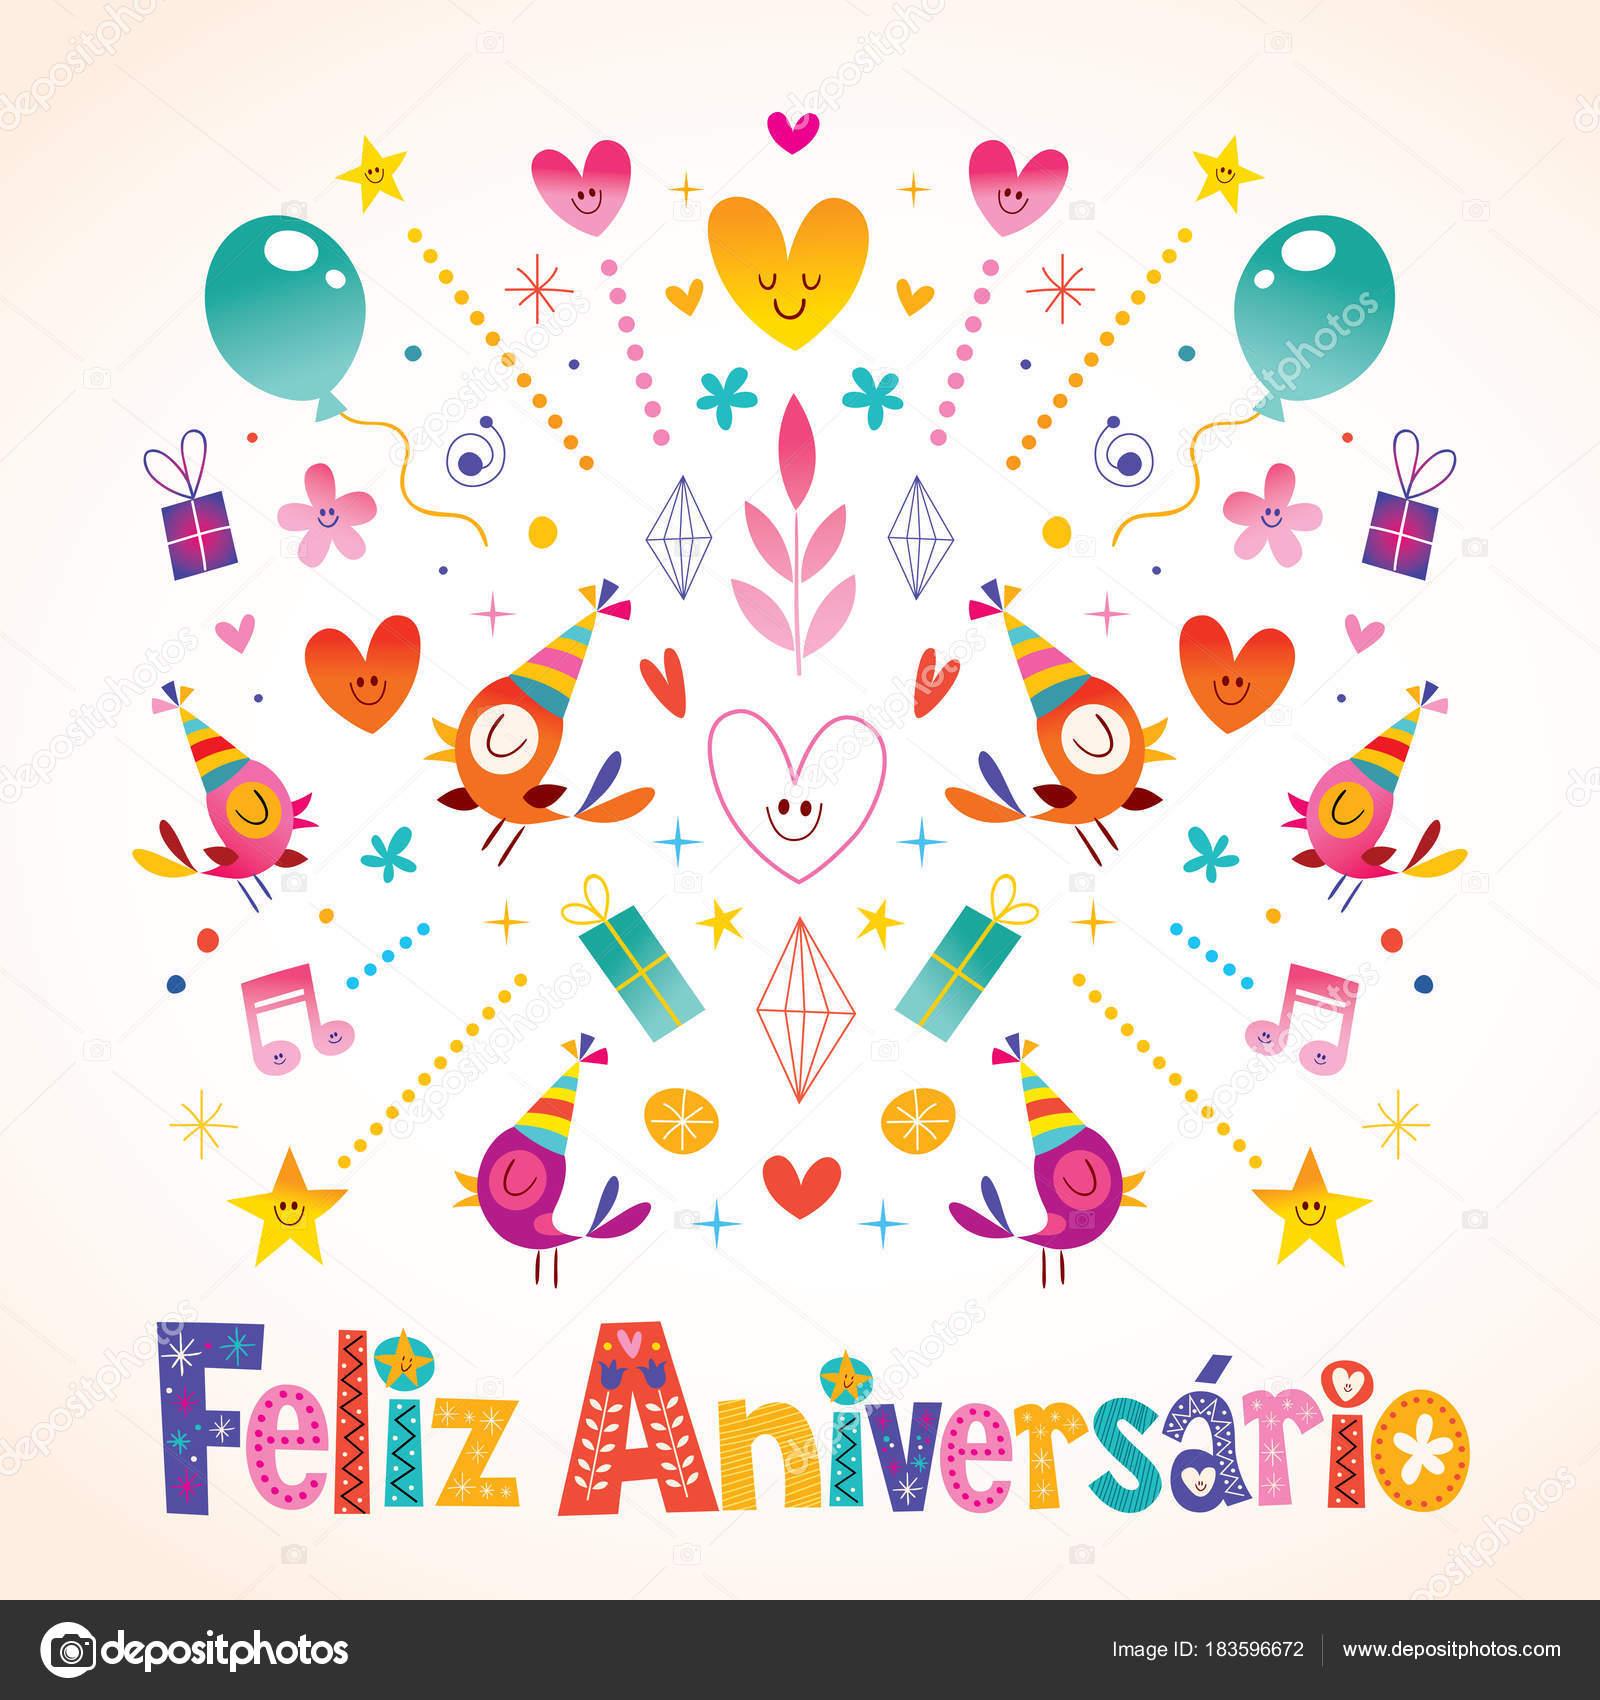 Images Happy Birthday Wishes In Brazilian Portuguese Feliz Aniversario Brazilian Portuguese Happy Birthday Card Stock Vector C Aliasching 183596672